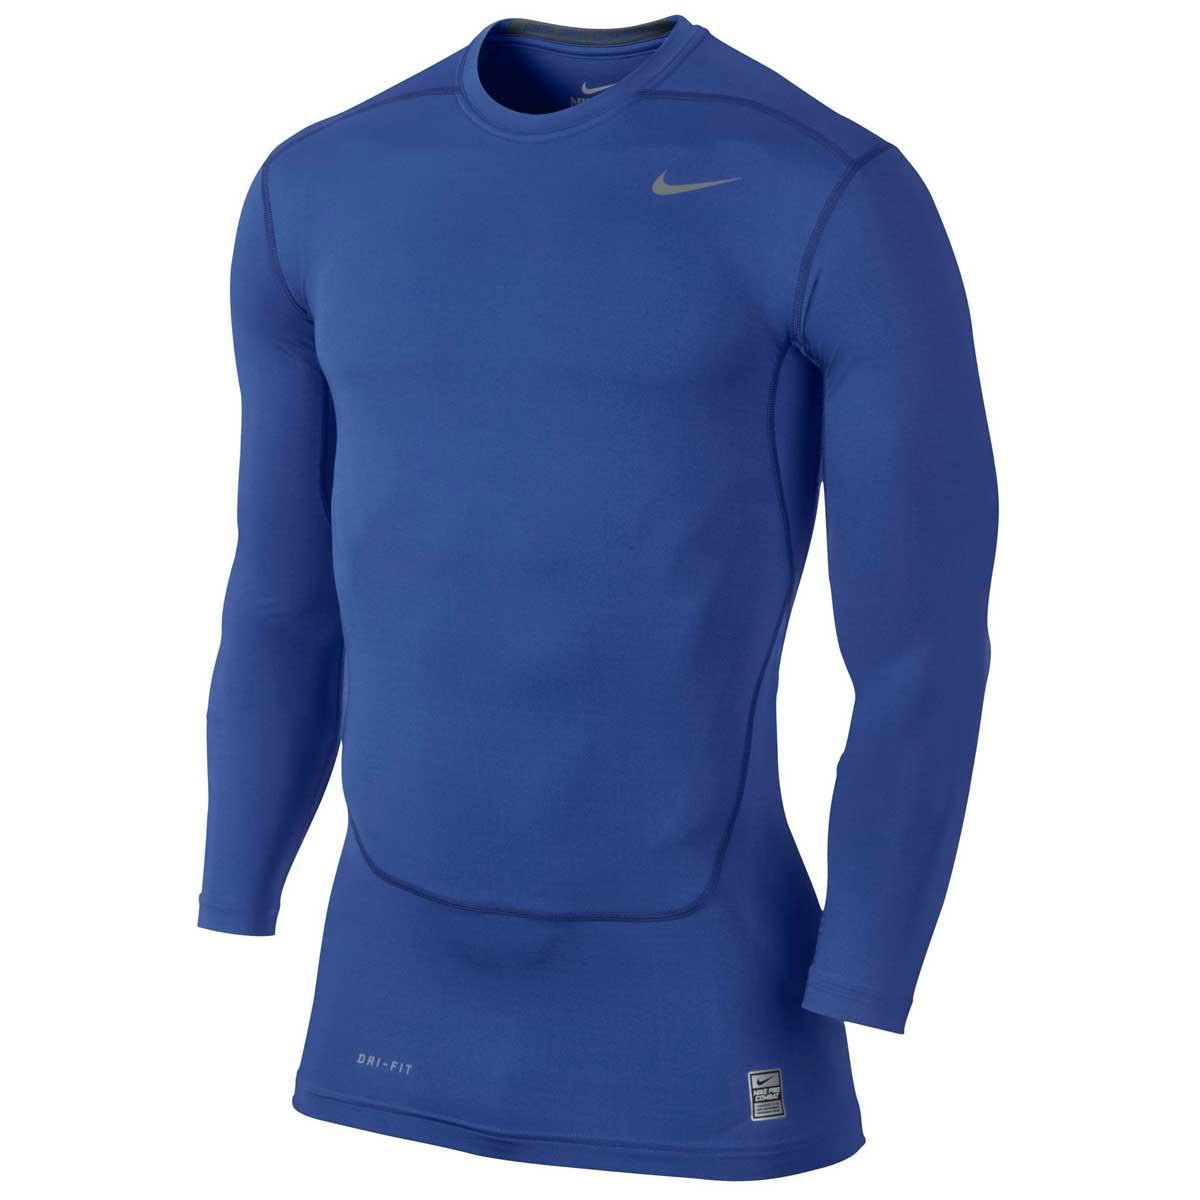 Buy Nike Pro Combat Long Sleeve Top Online India